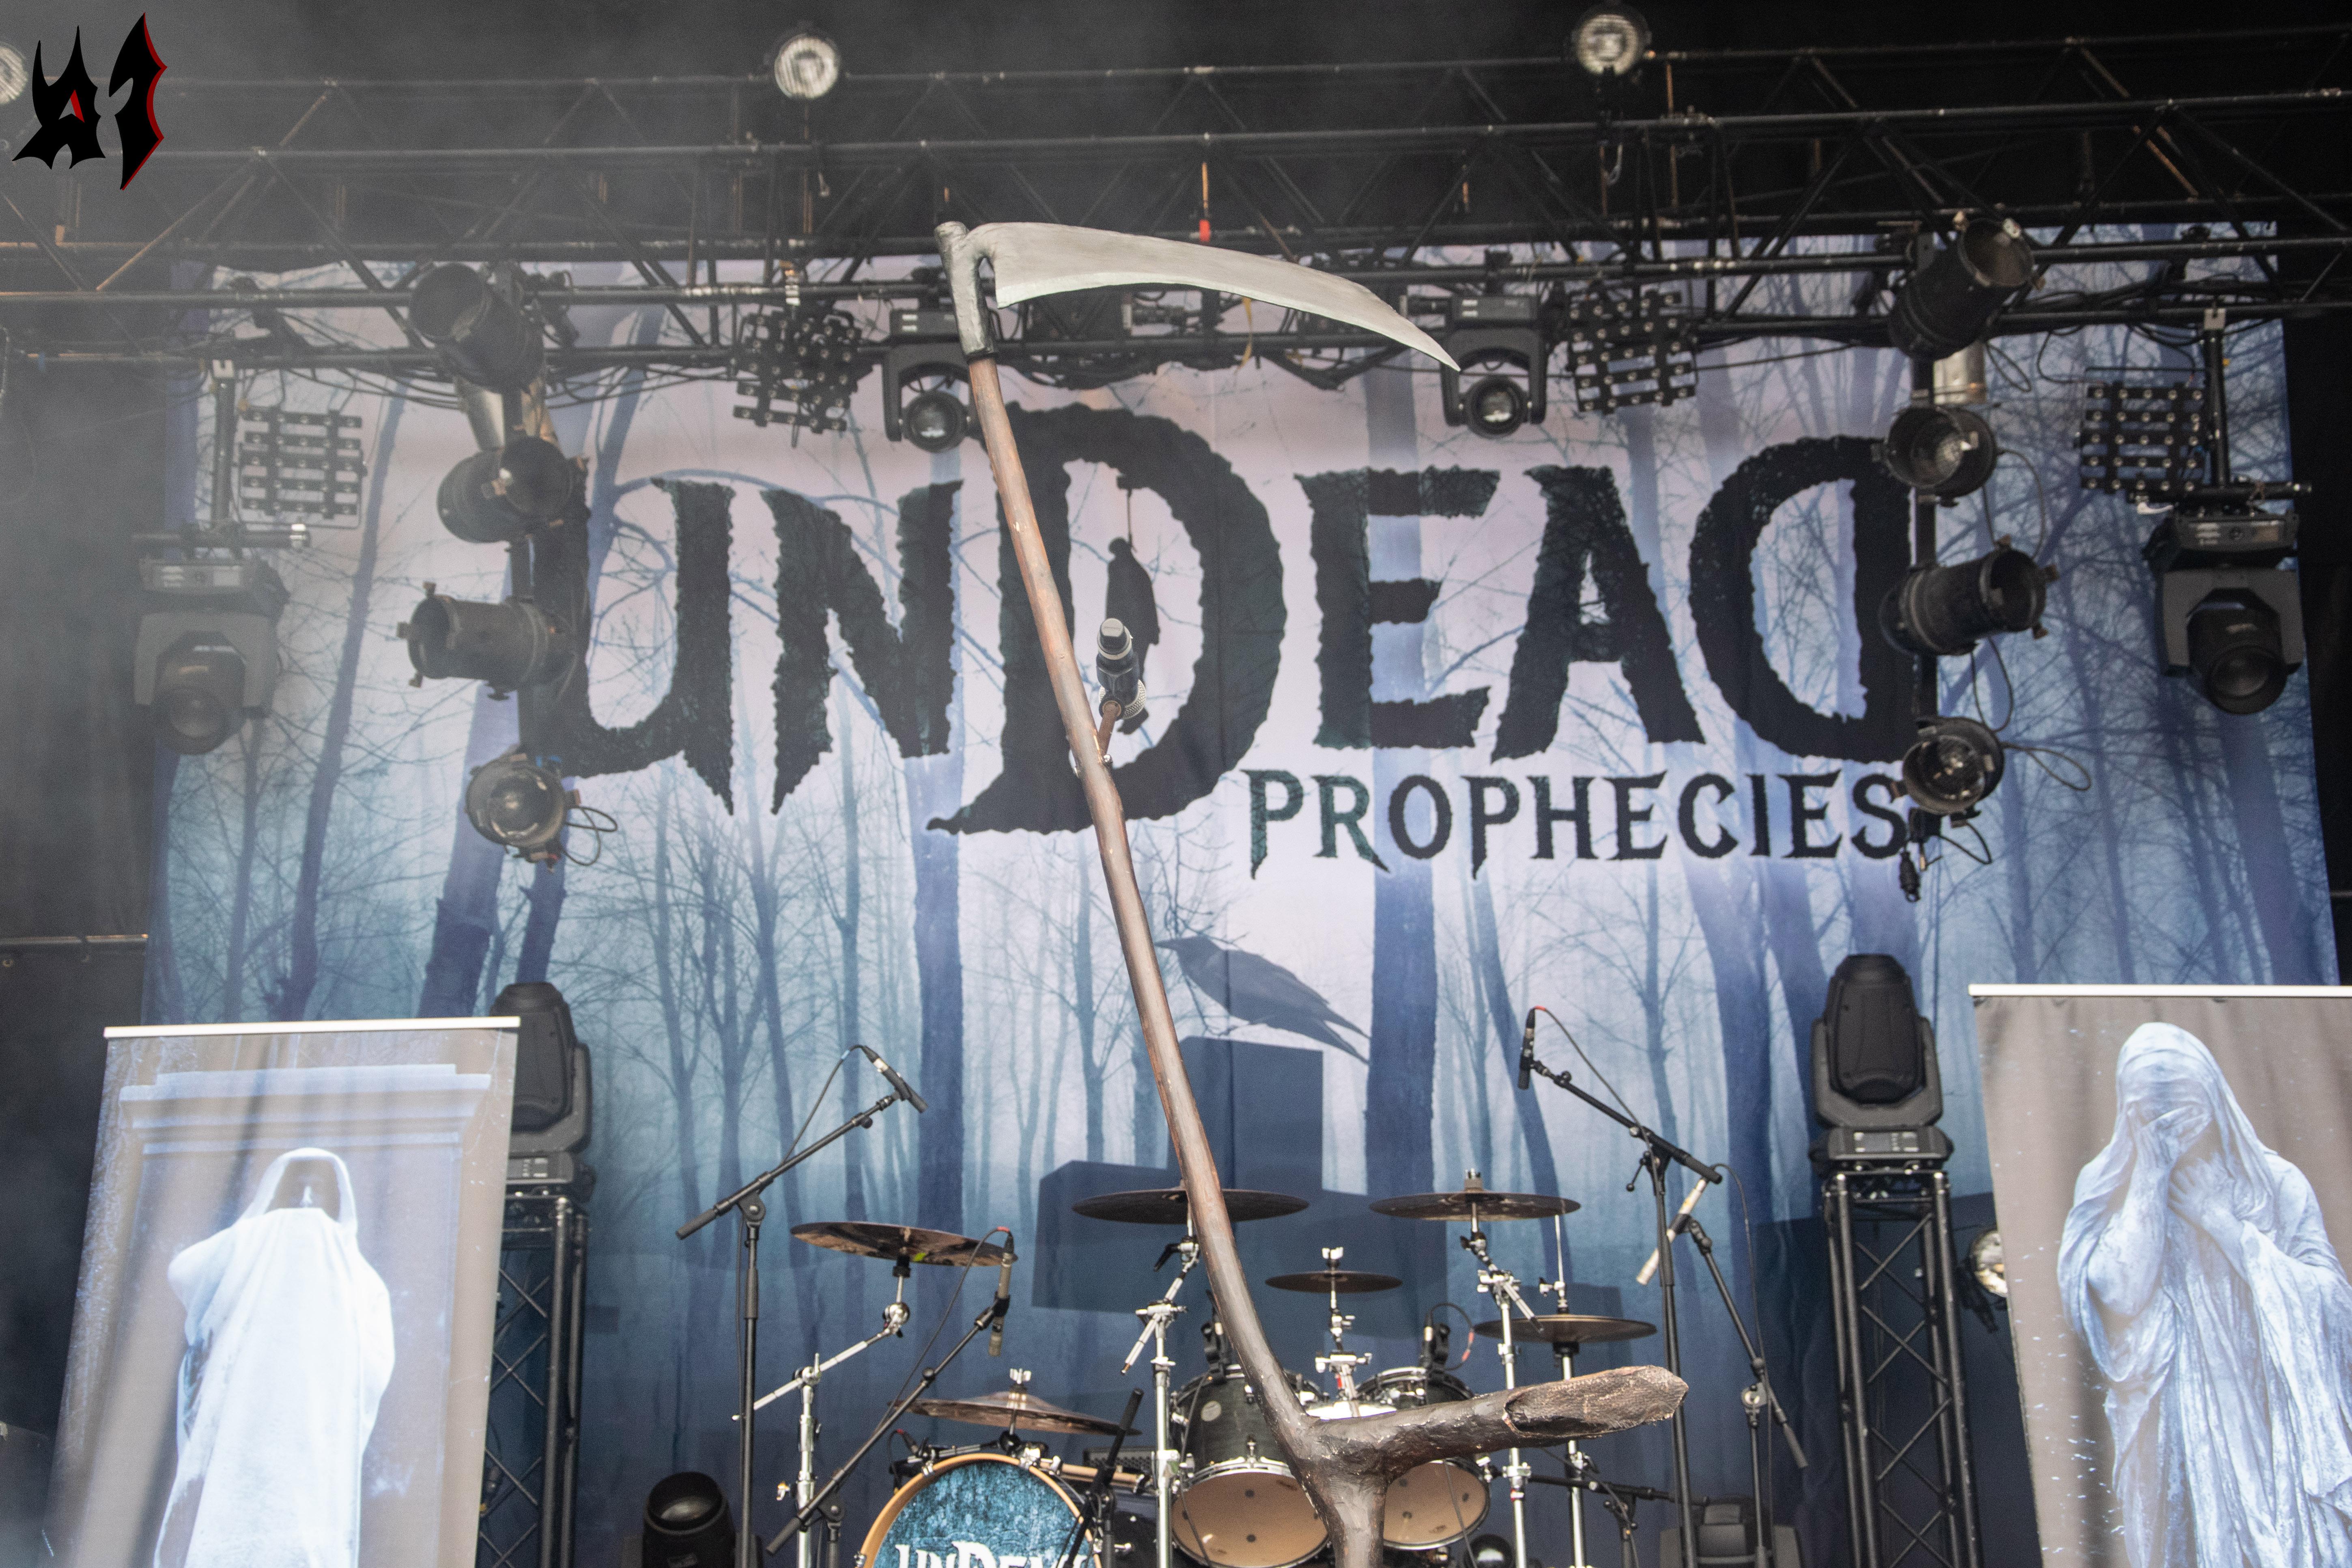 Motocultor - Undead Prophecies - 2